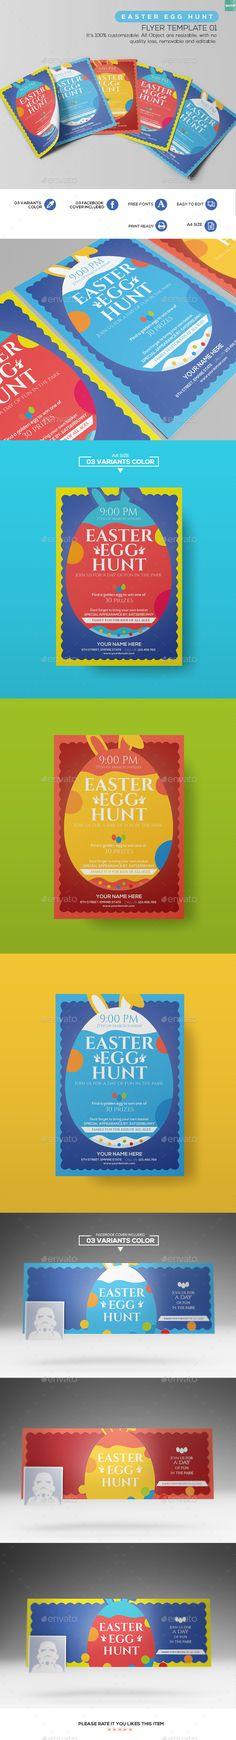 Easter Egg Hunt - Flyer Template 01